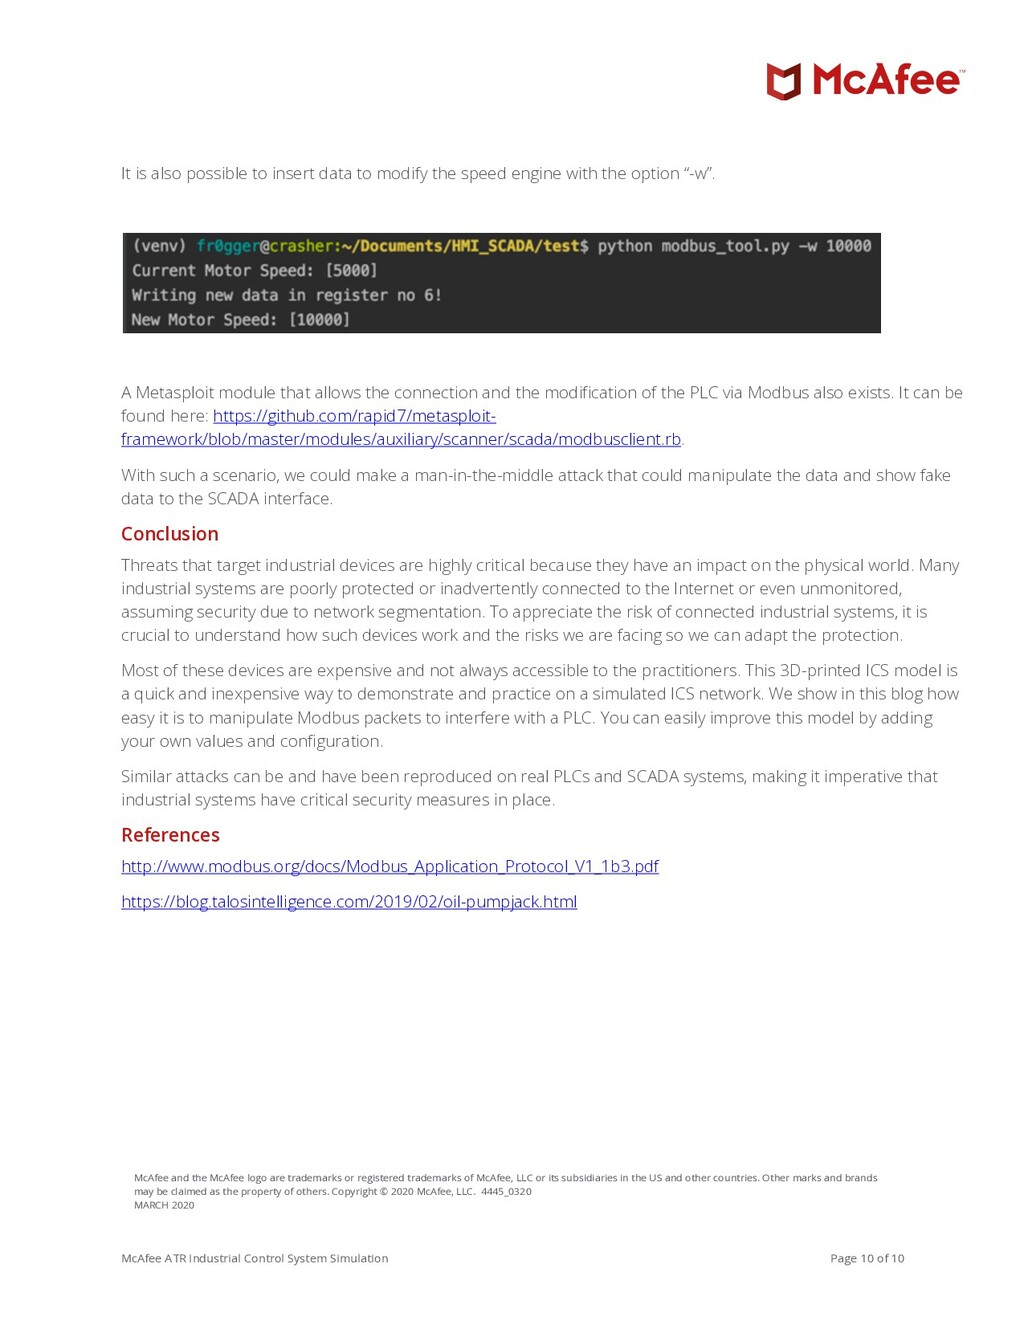 McAfee ATR Industrial Control System Simulation...